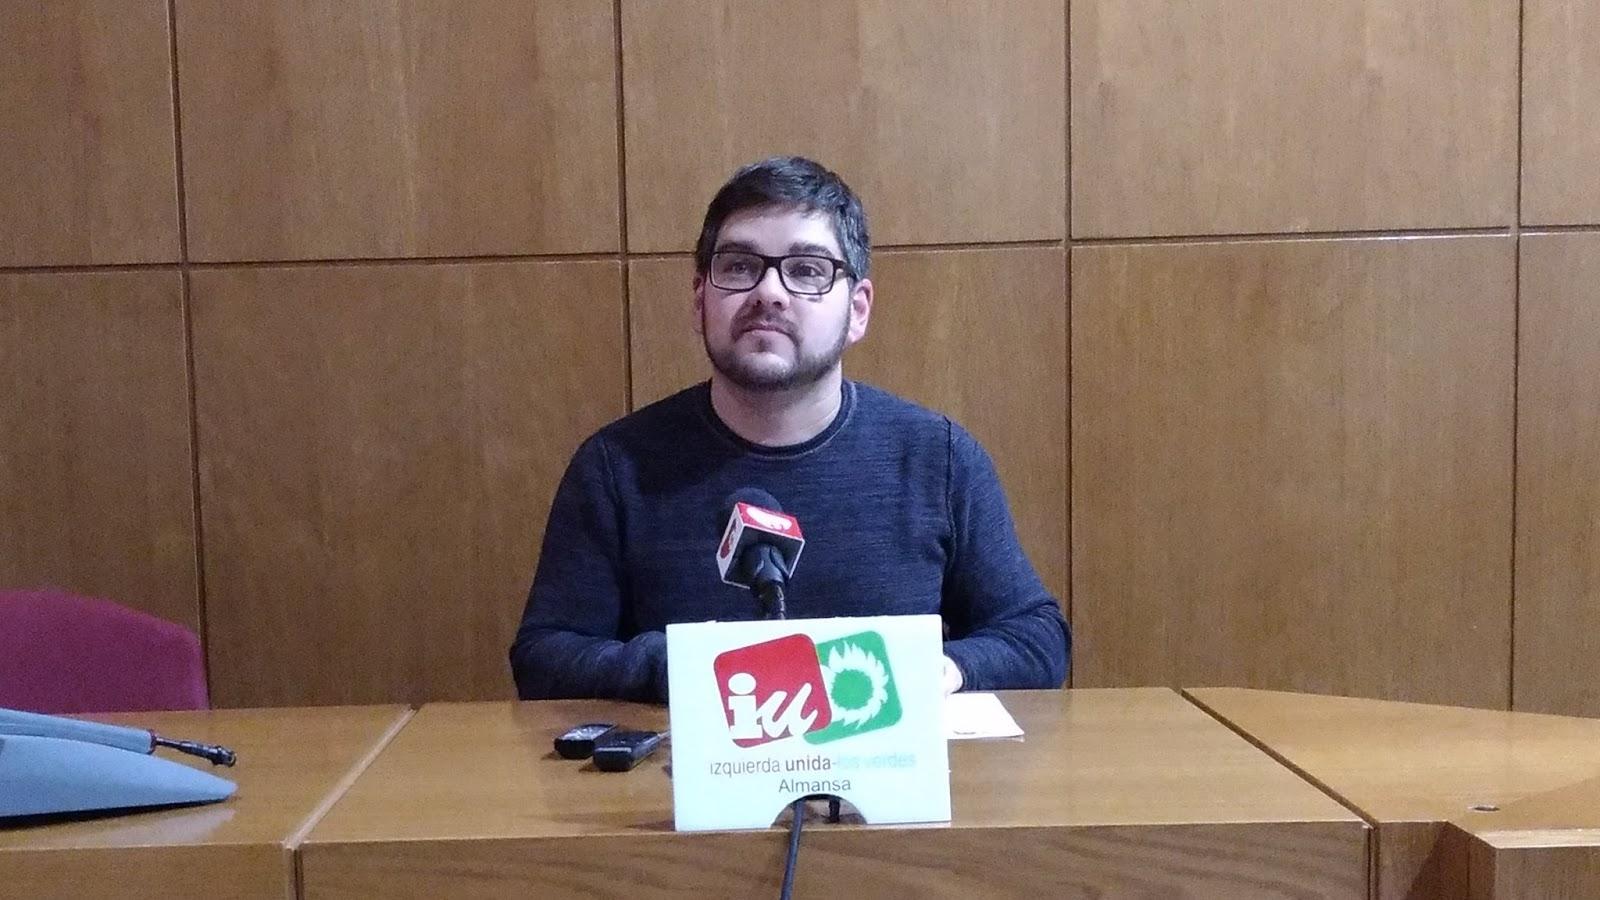 Izquierda Unida - Los Verdes Almansa: RUEDA DE PRENSA | IU-LV ...